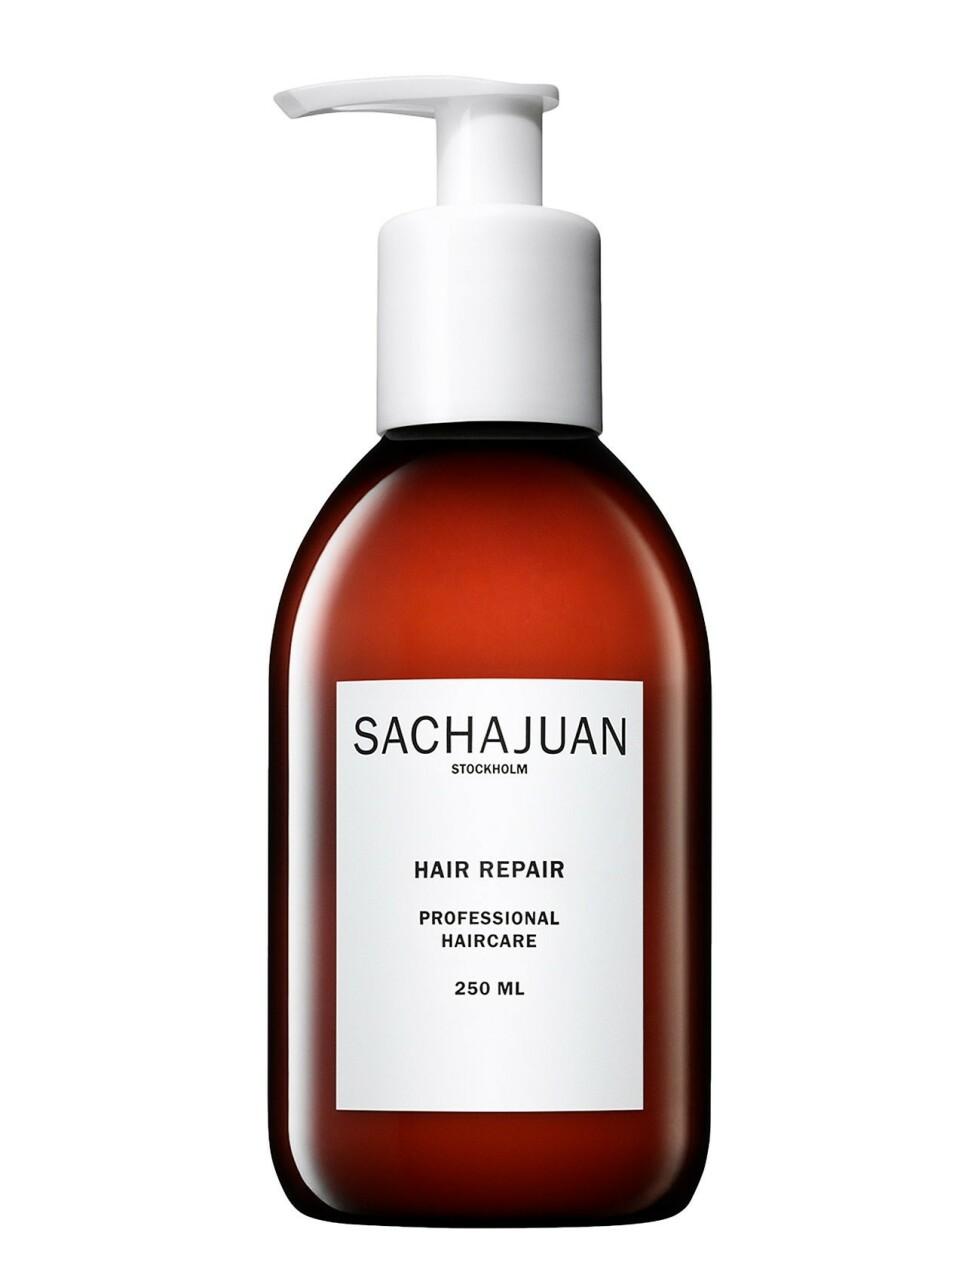 Hair Repair fra Sachajuan |200,-| https://www.boozt.com/no/no/sachajuan/hair-repair_19325659/19325660?navId=67362&group=listing&position=1400000